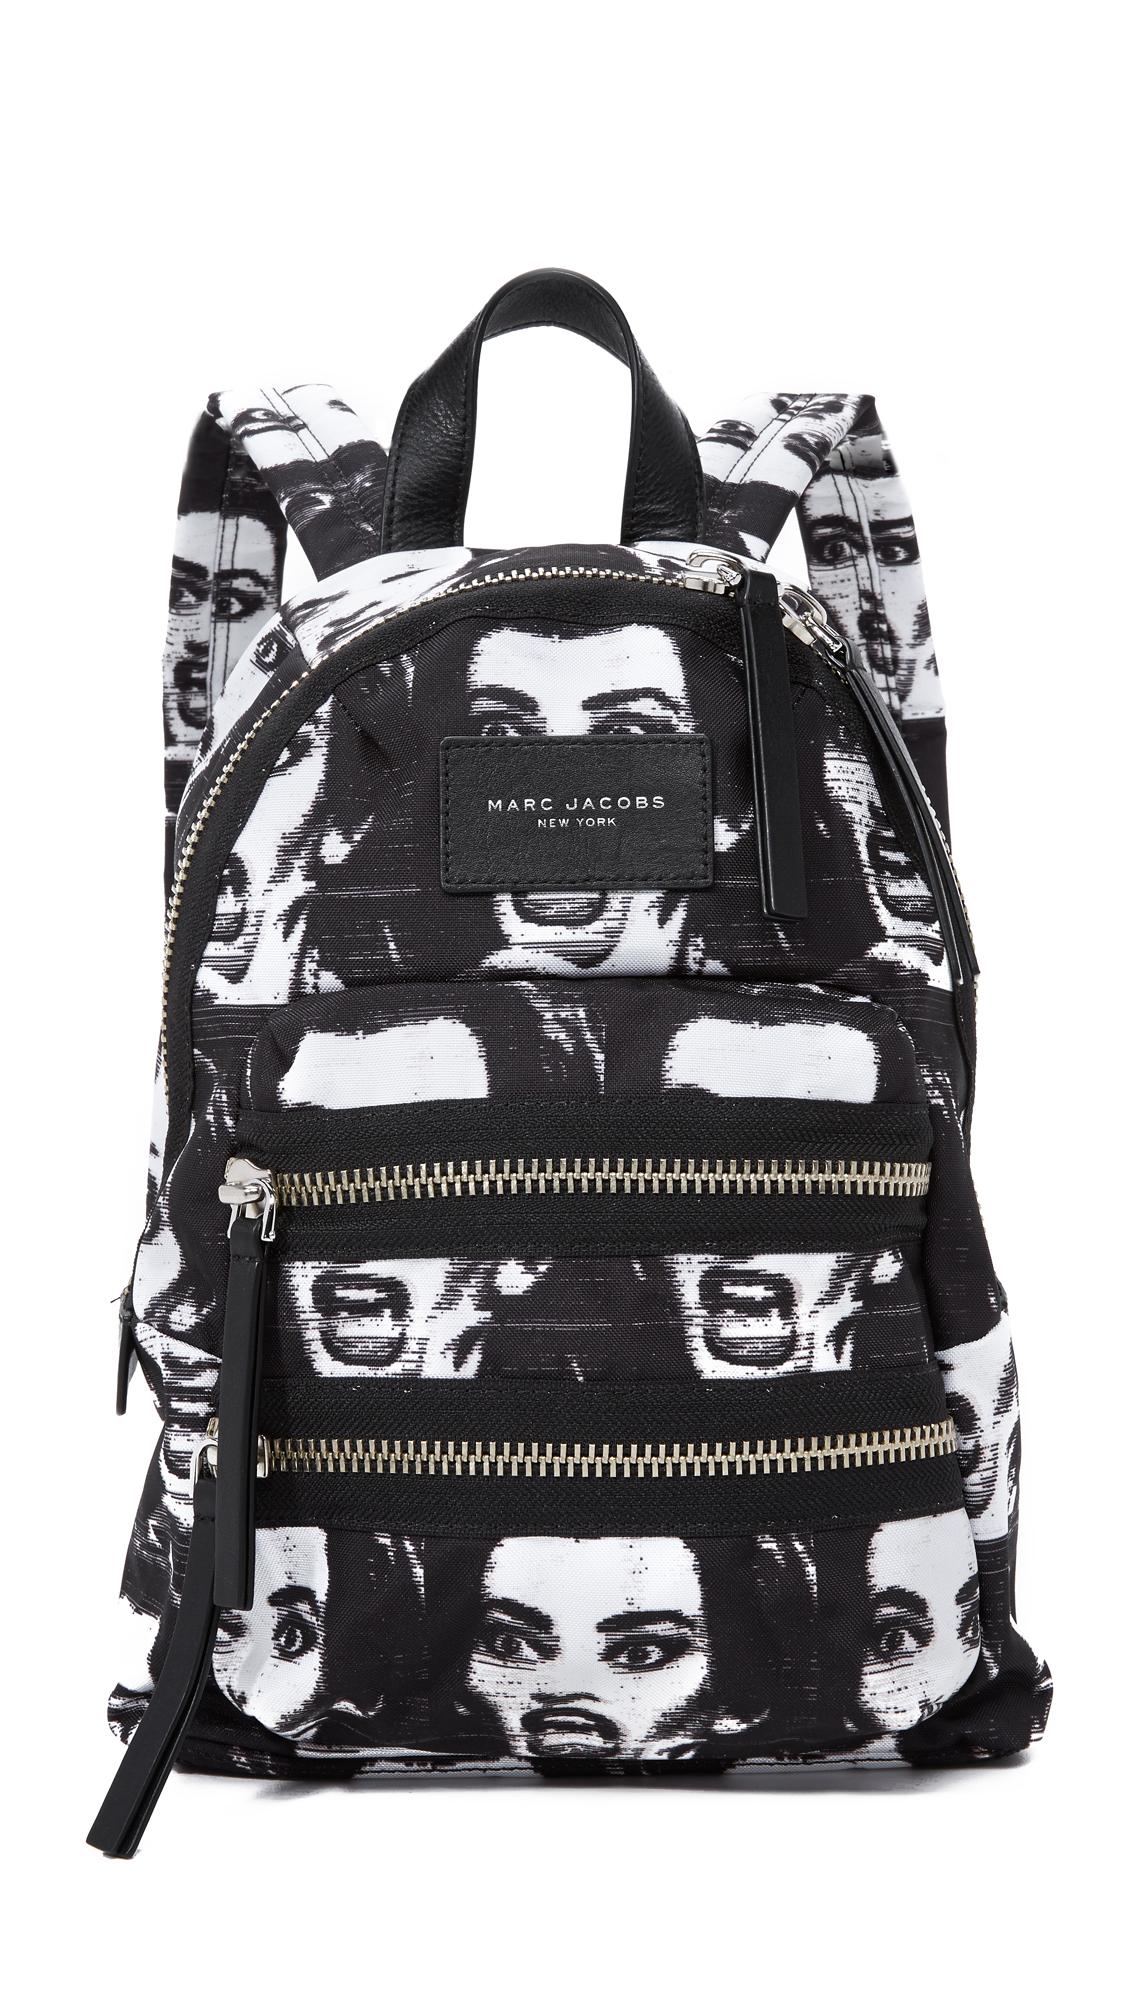 Marc Jacobs Maria Callas Mini Backpack - Black Multi